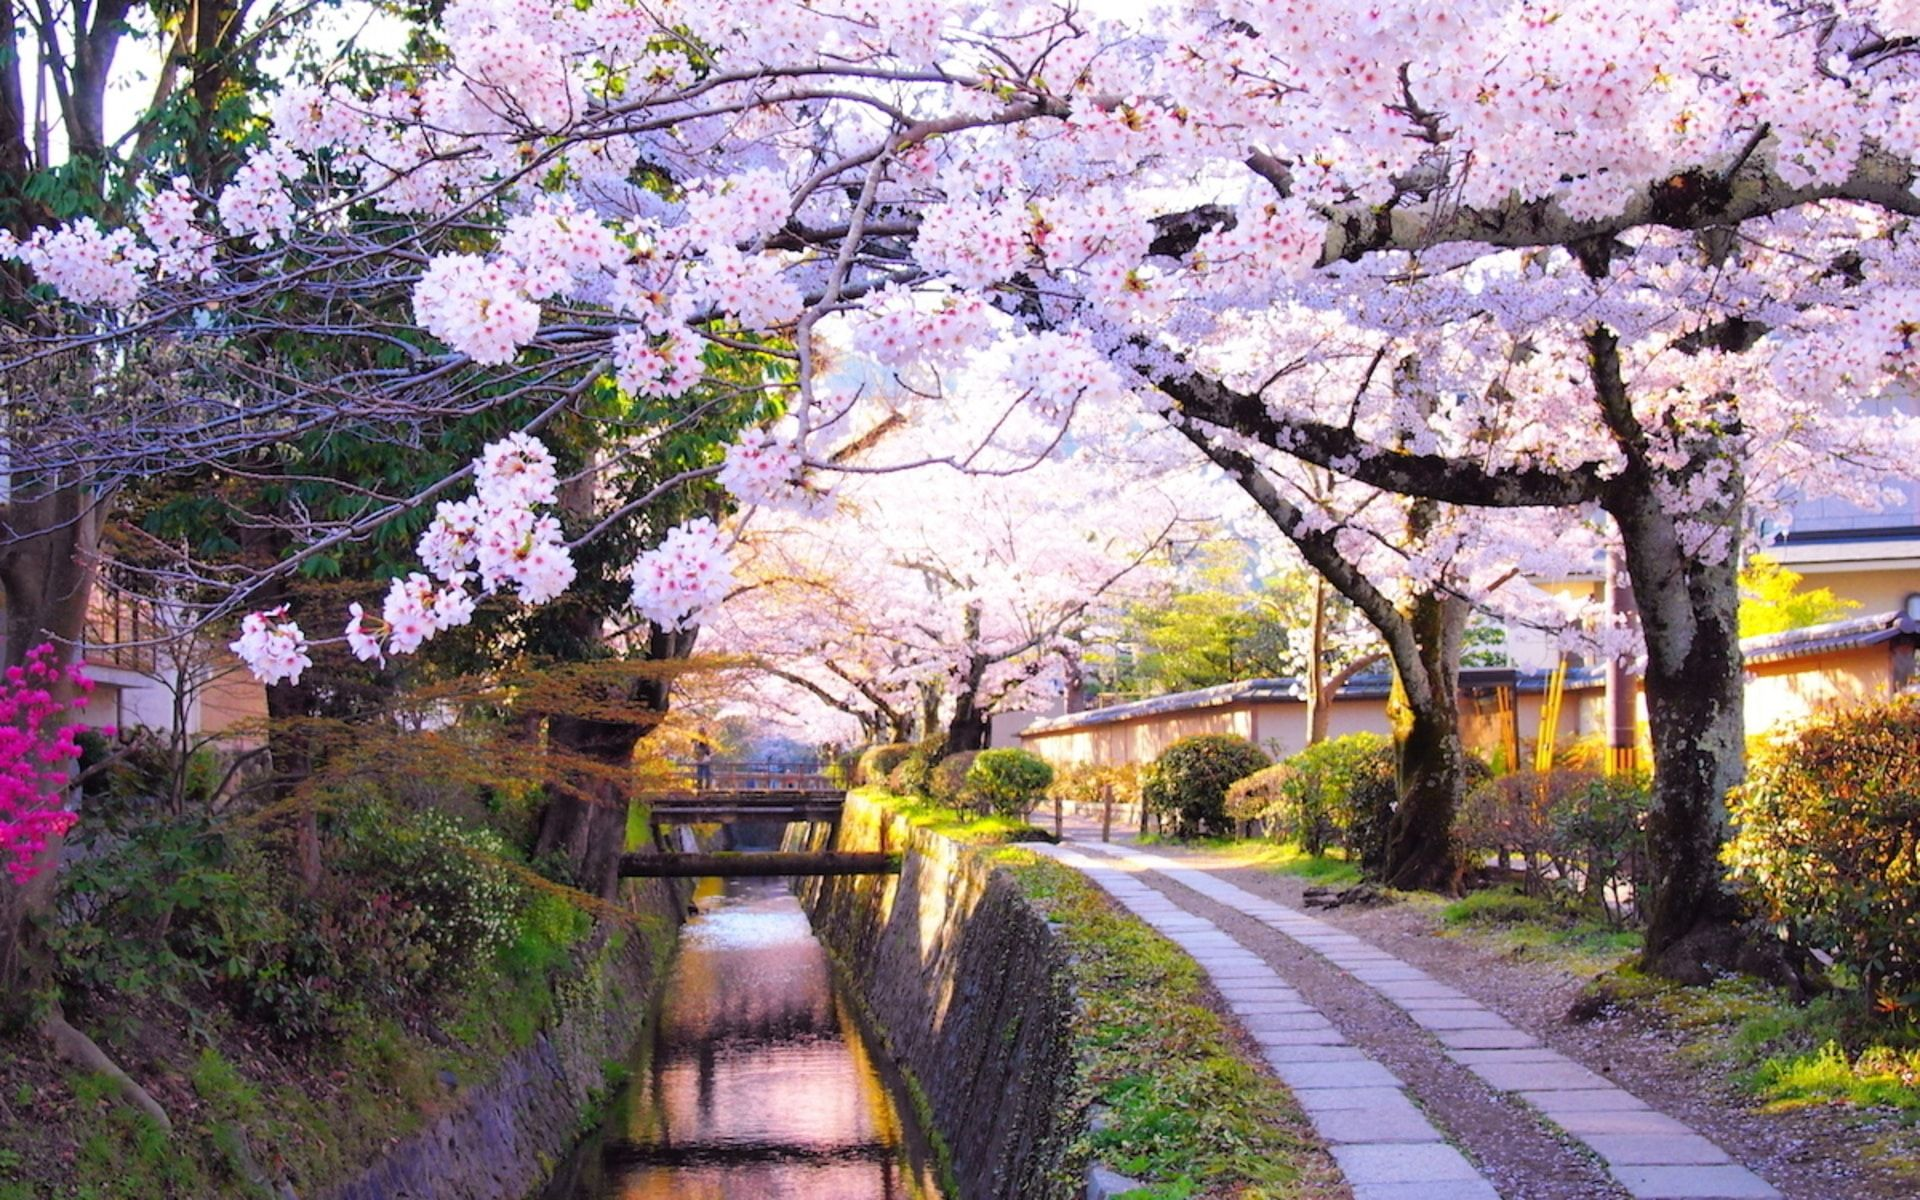 Sakura Season When And Where To See Japan S Cherry